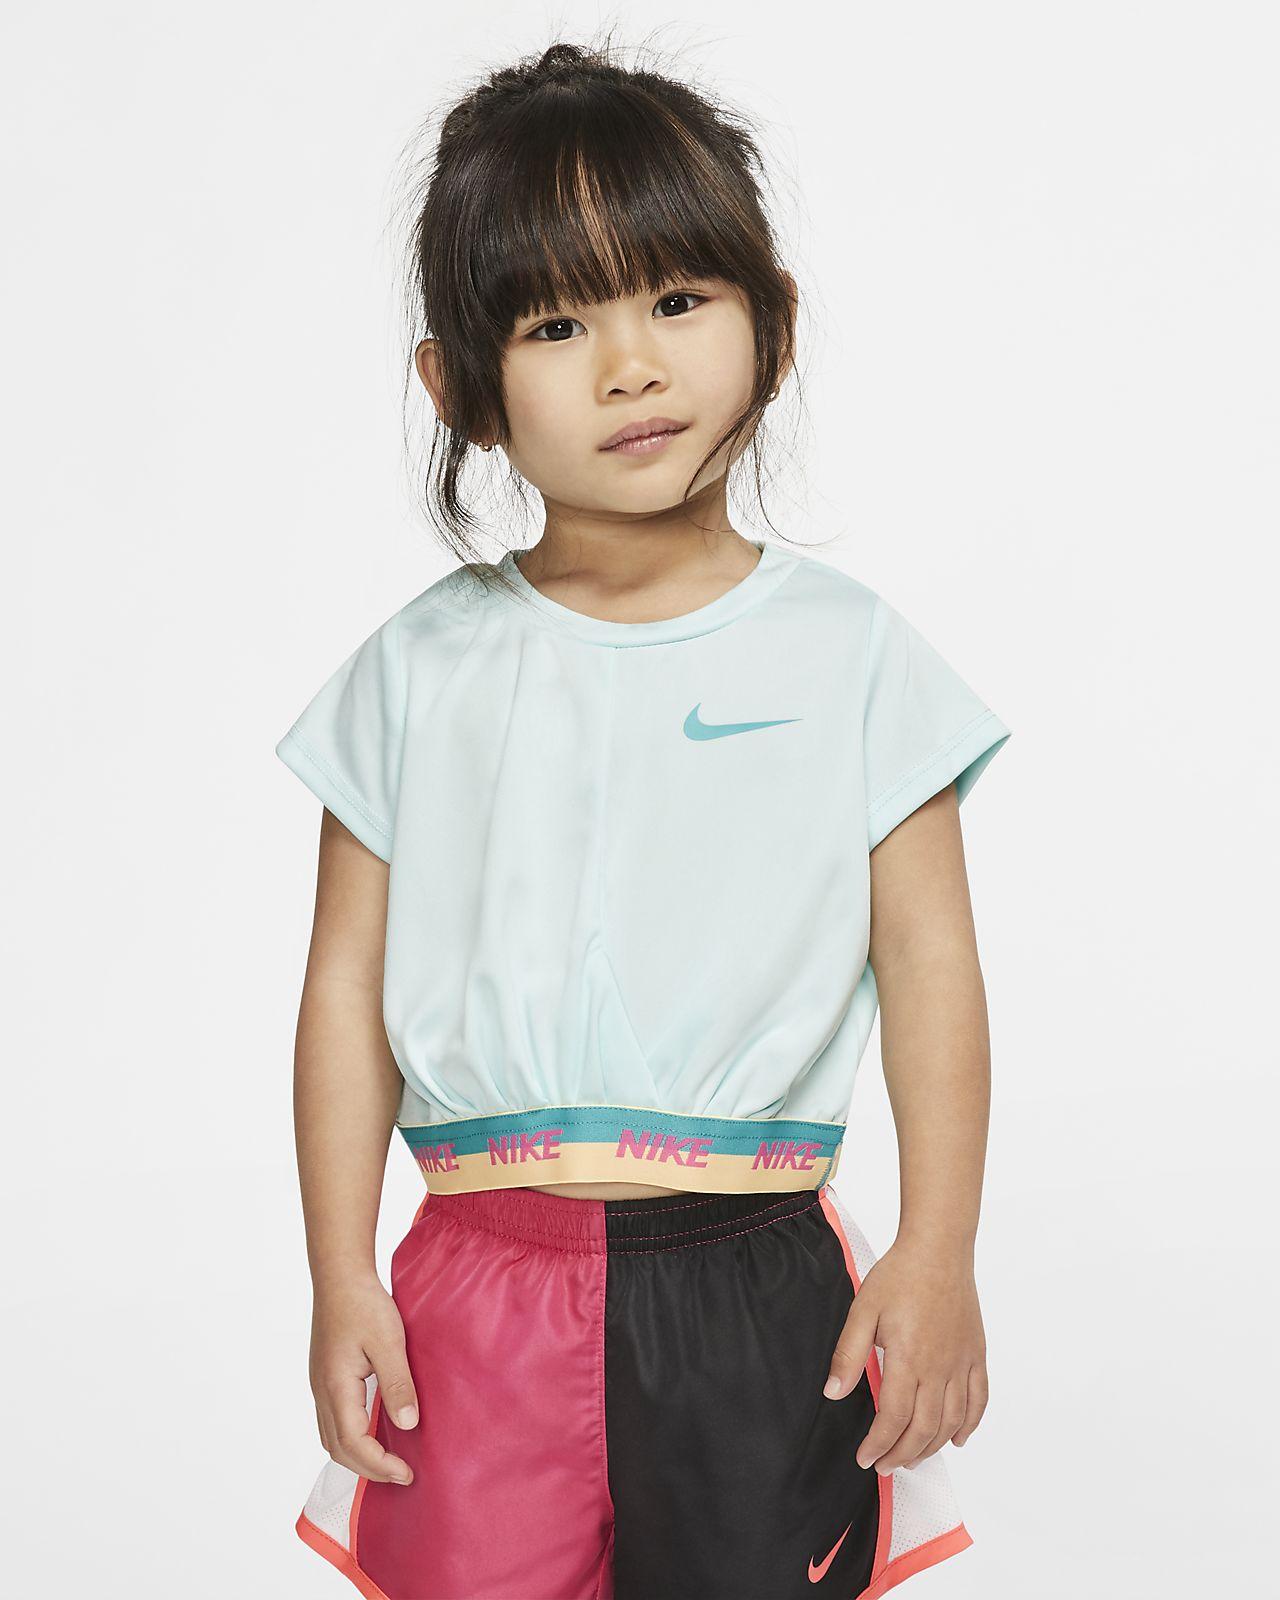 Nike Dri-FIT Toddler Cropped Top